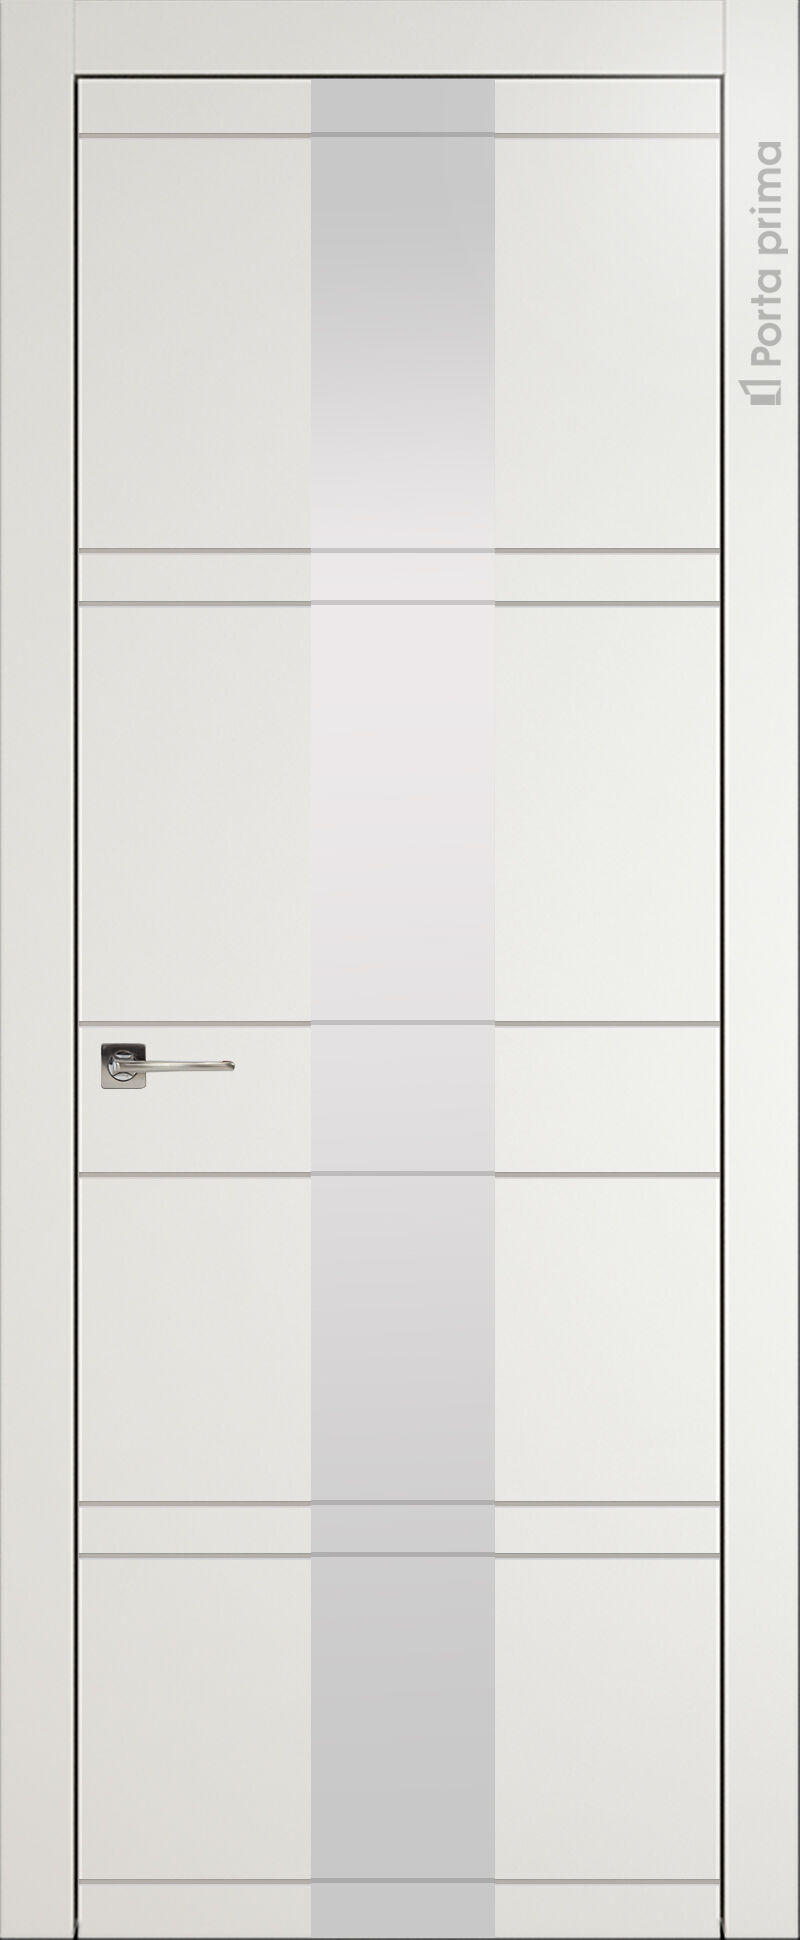 Tivoli Ж-2 цвет - Бежевая эмаль (RAL 9010) Со стеклом (ДО)